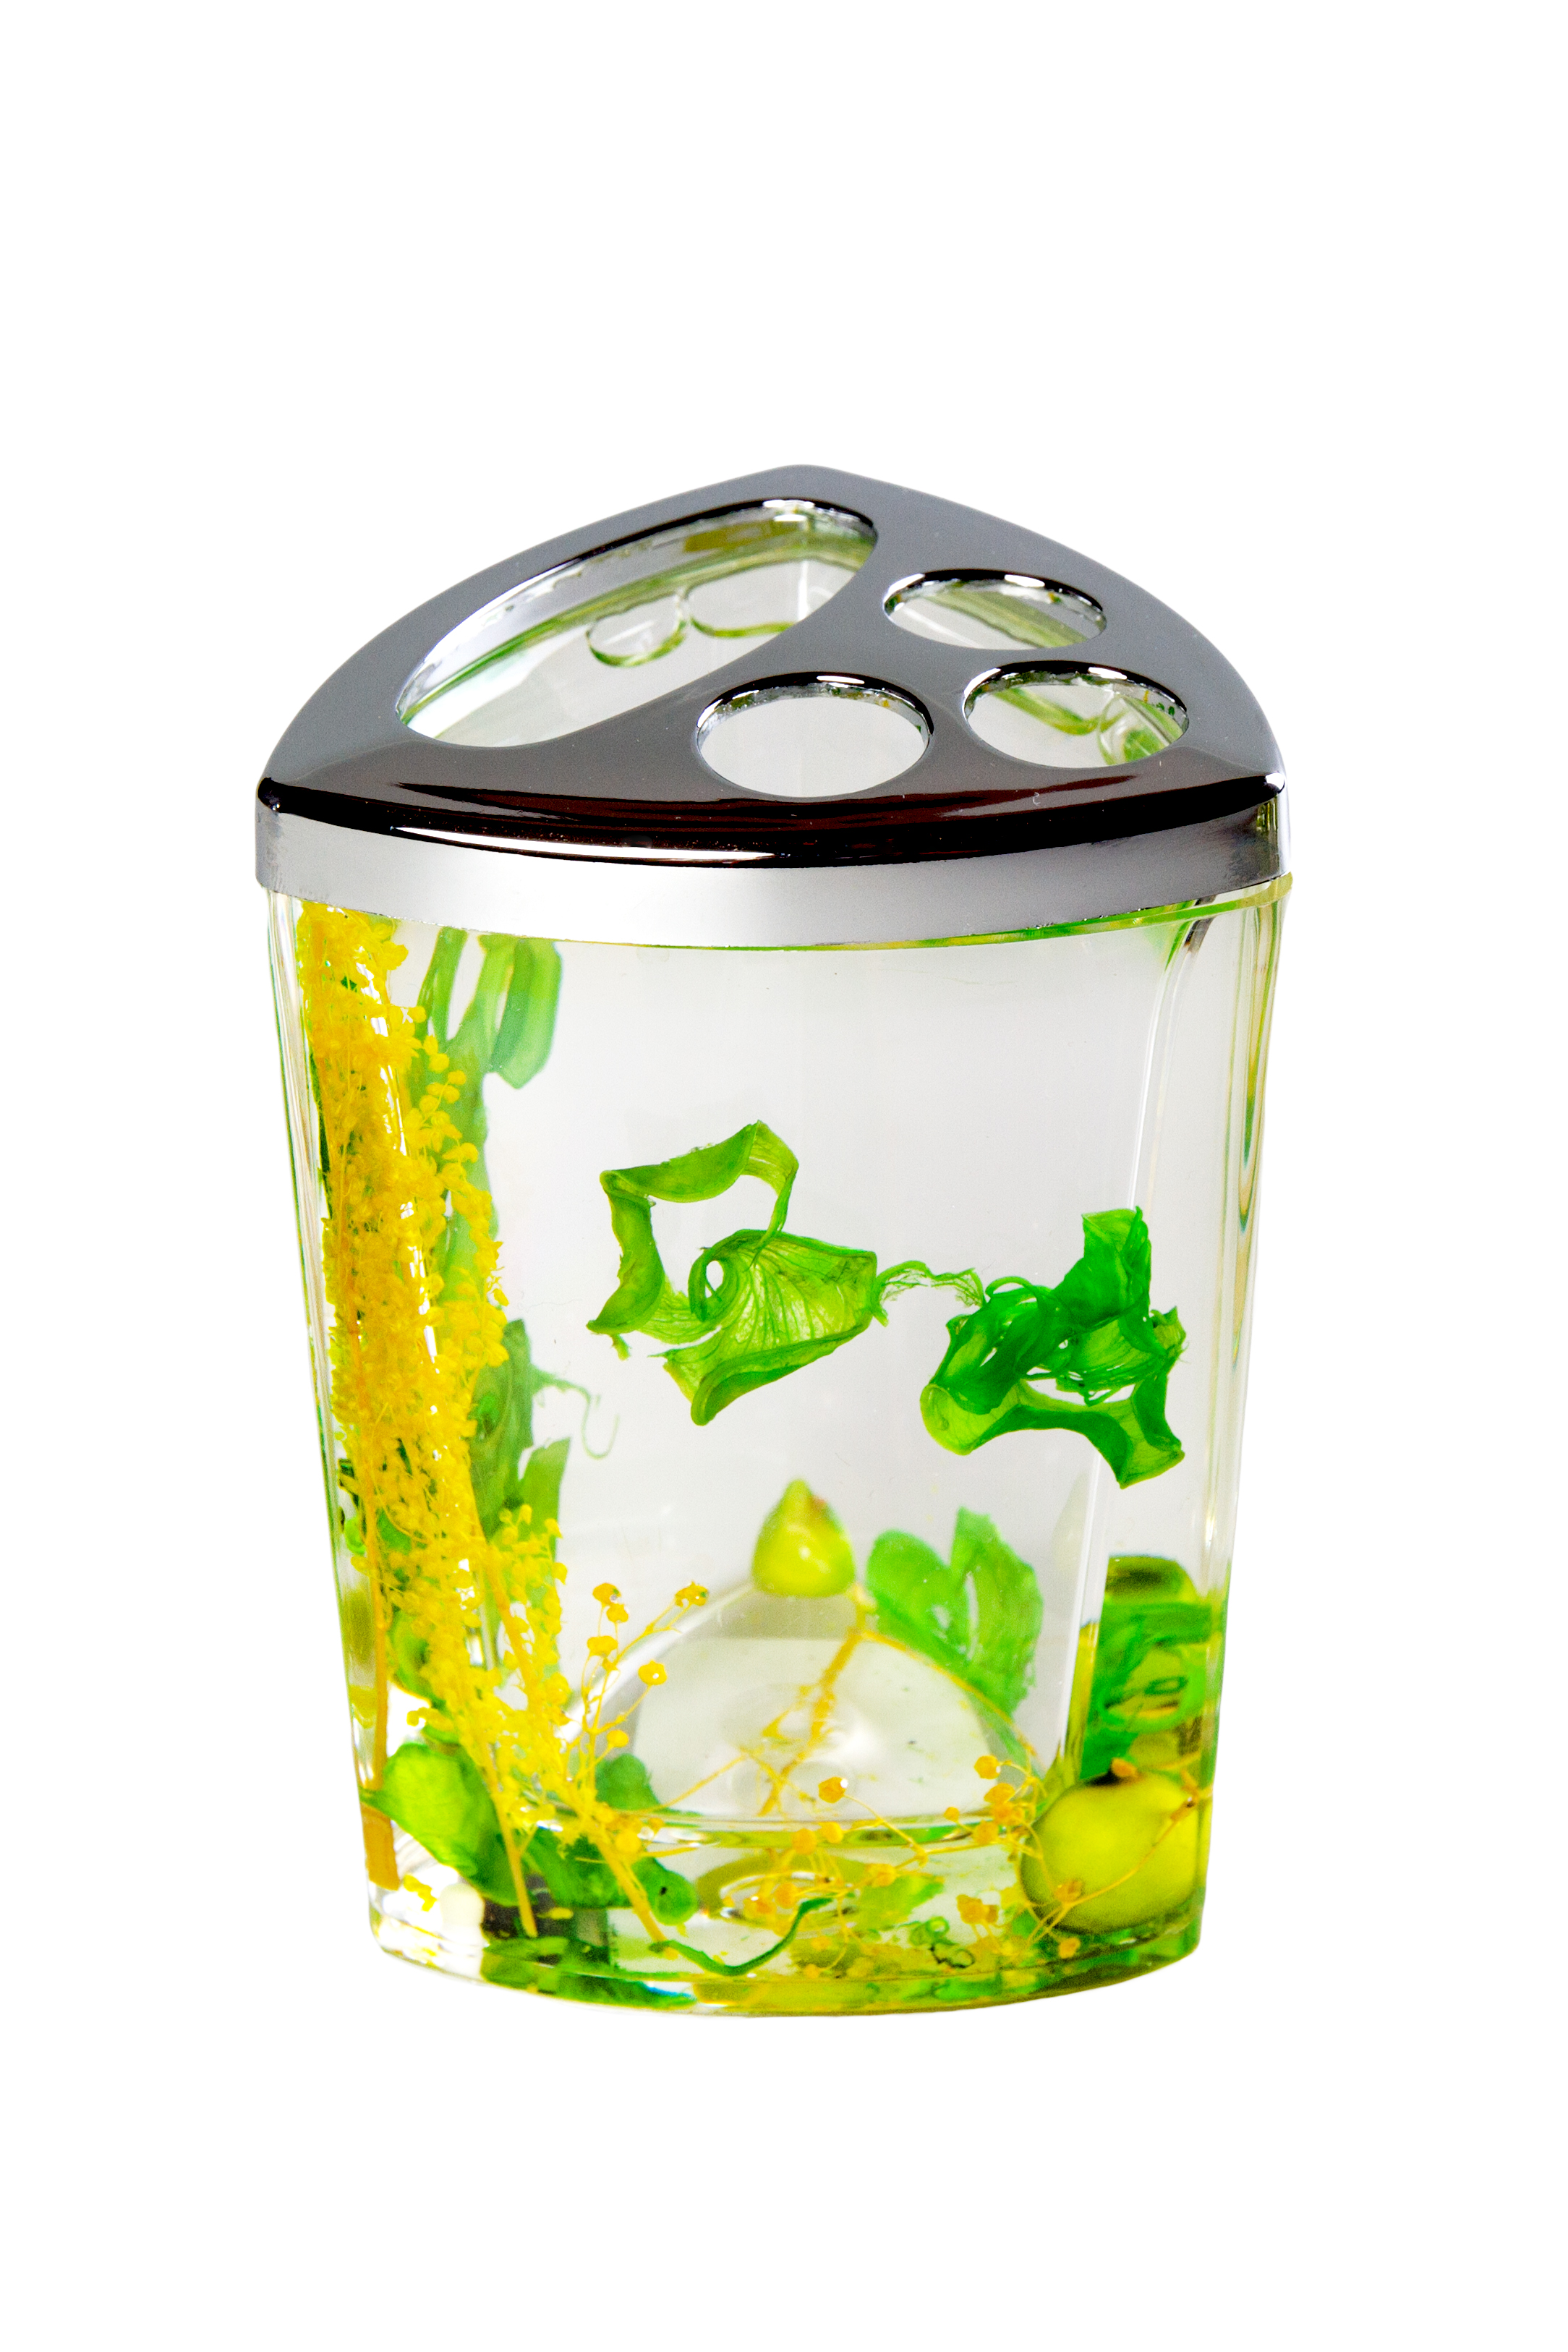 Стакан VanstoreАксессуары для ванной комнаты<br>Назначение аксессуара: стакан,<br>Цвет покрытия: прозрачный,<br>Материал: пластик<br>